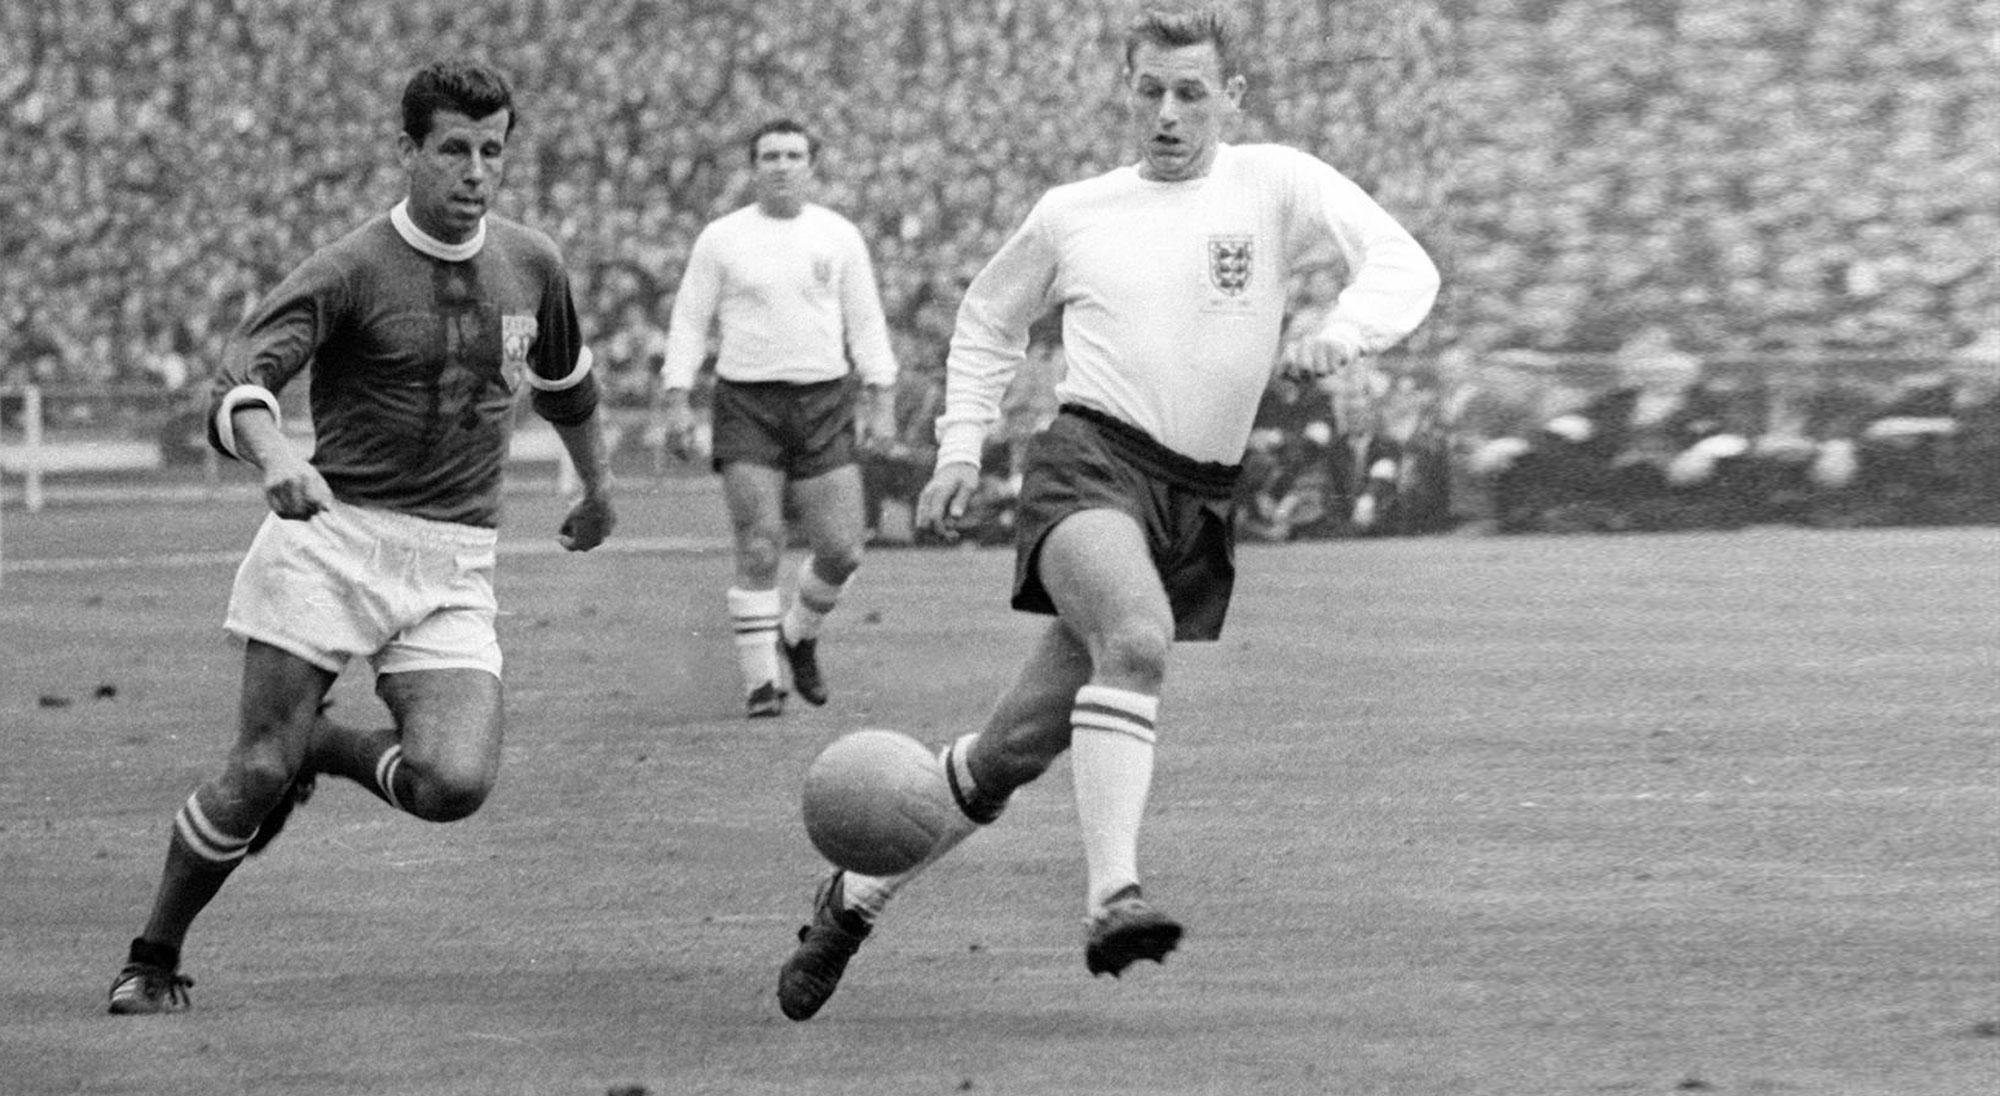 Masopust con el FIFA XI contra Inglaterra en 1963